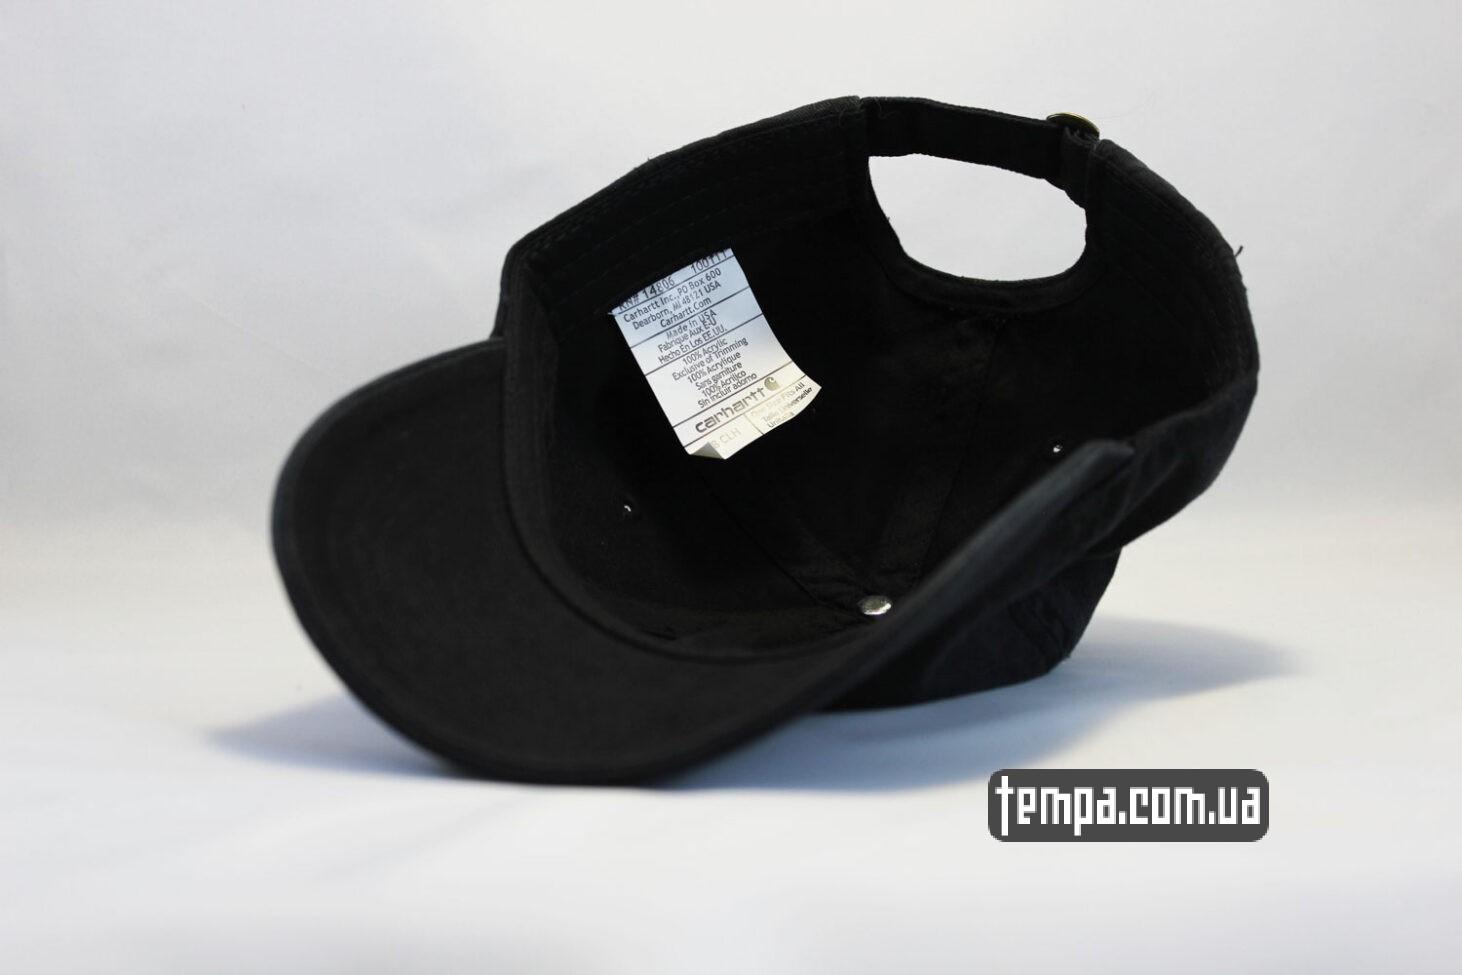 carhartt USA кепка бейсболка carhartt кожаный логтип черная